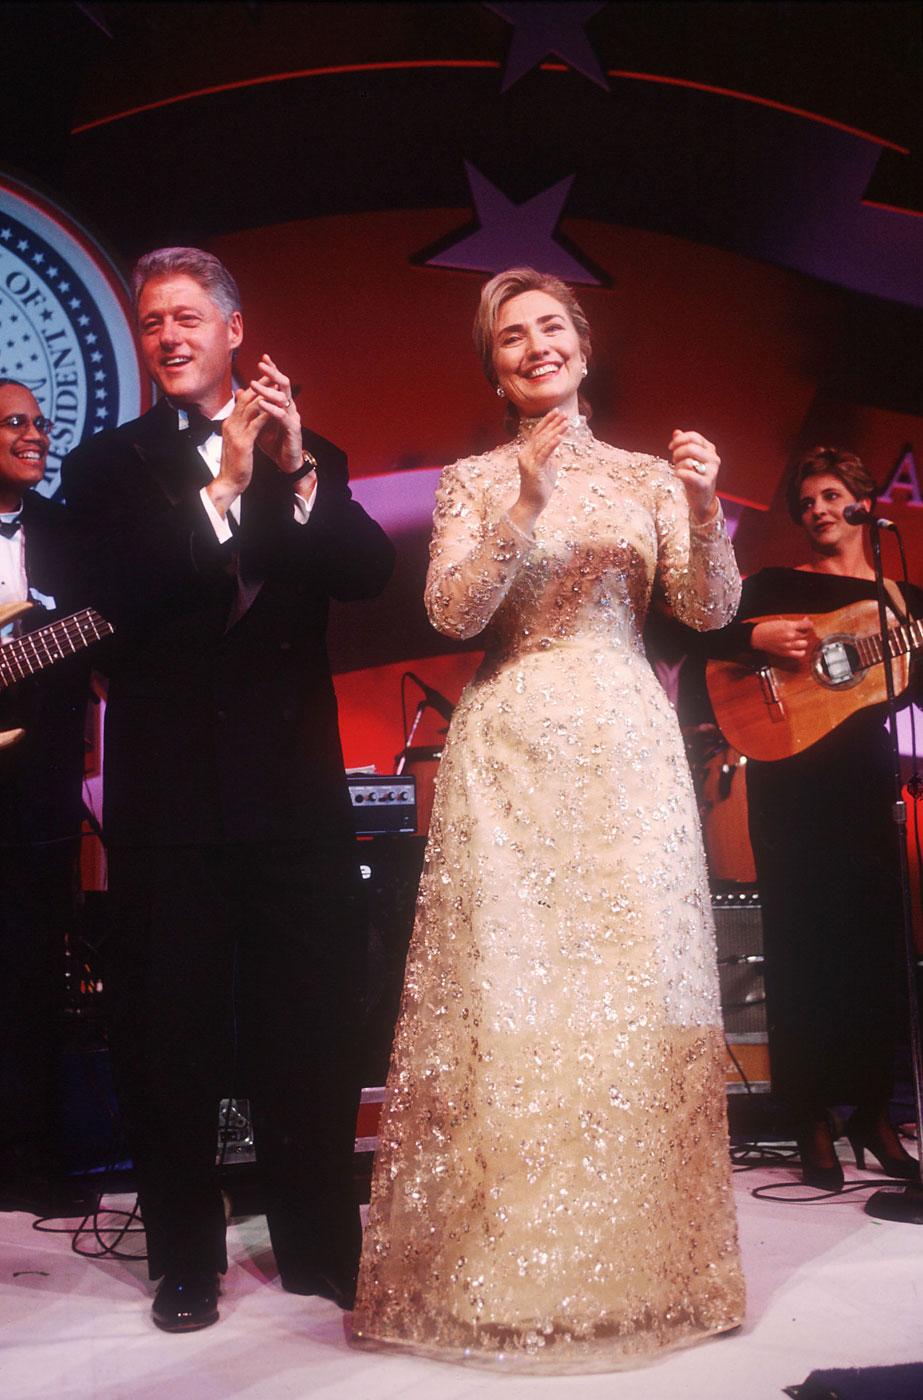 Hillary Clinton wears Oscar de la Renta to the inaugural ball on January 20, 1997 in Washington, DC.